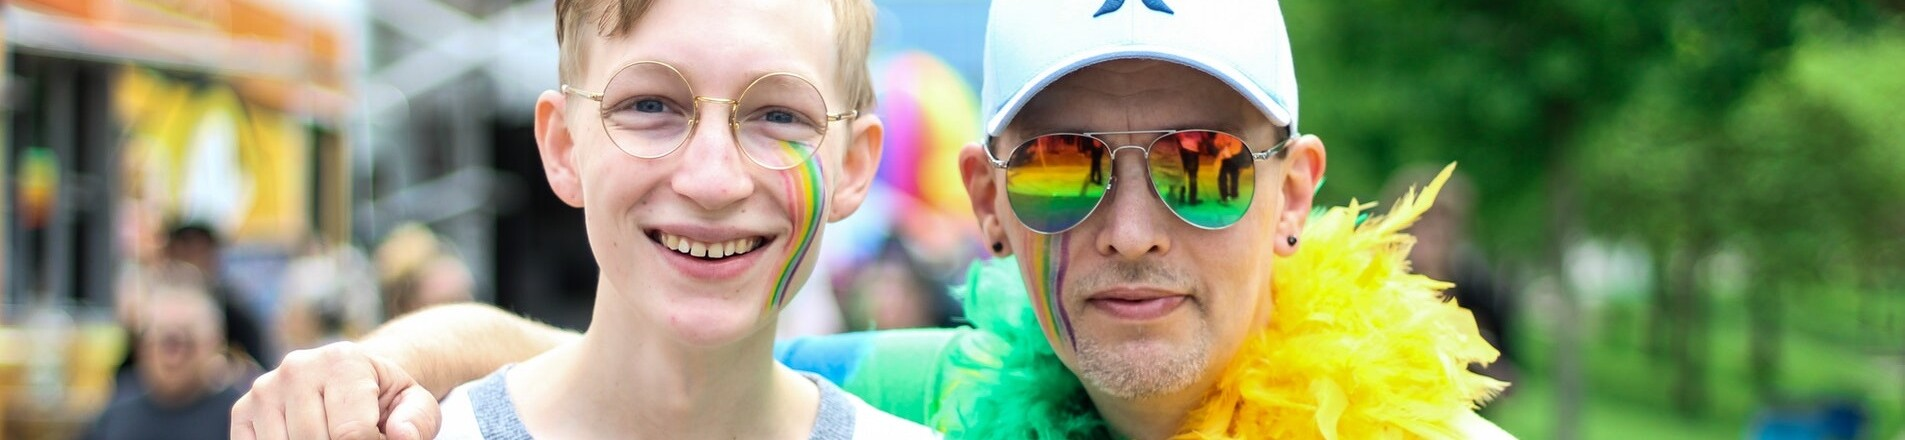 Transgender Awareness Week: 10 Transgender Myths Explained